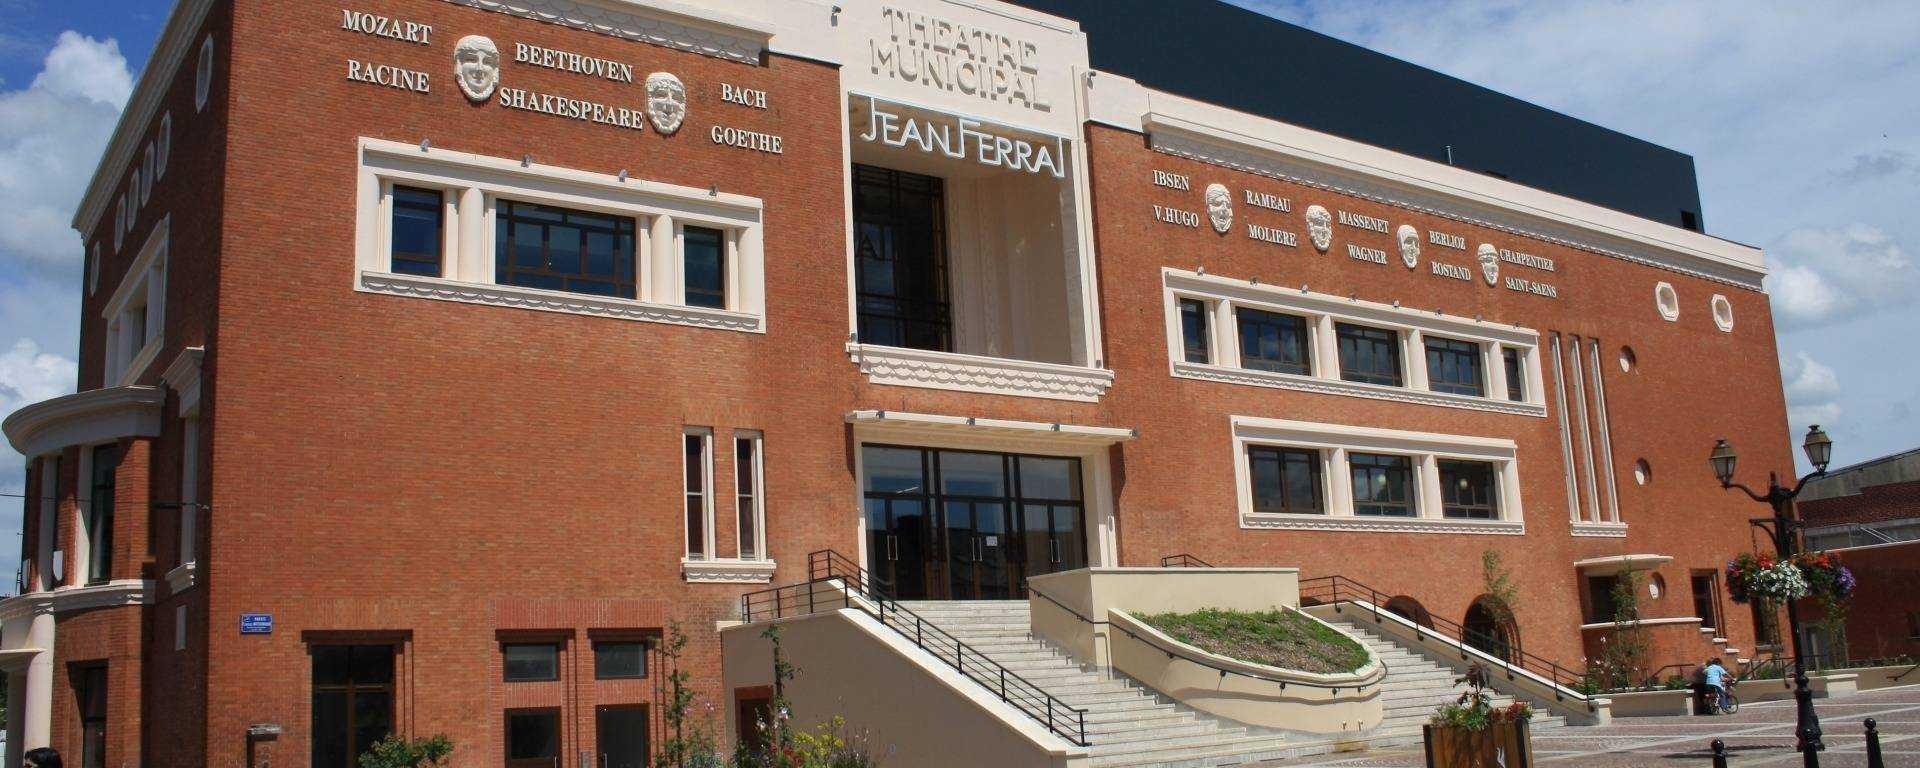 la façade du théâtre Jean Ferrat